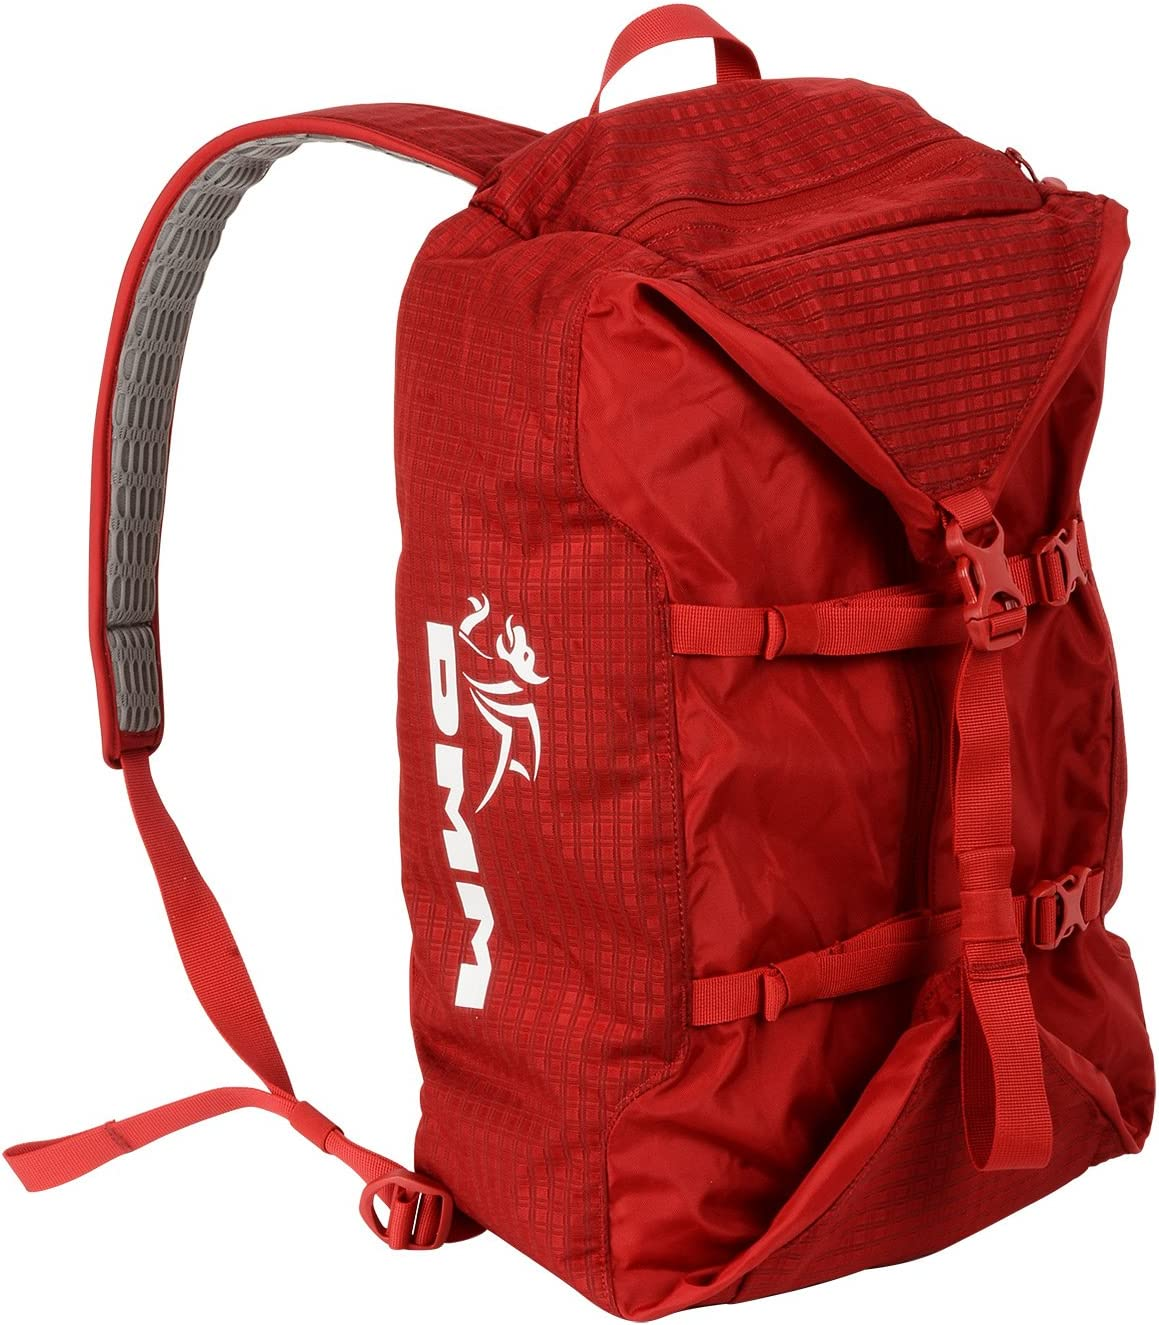 MD Dmm Classic Rope Bag 32 L